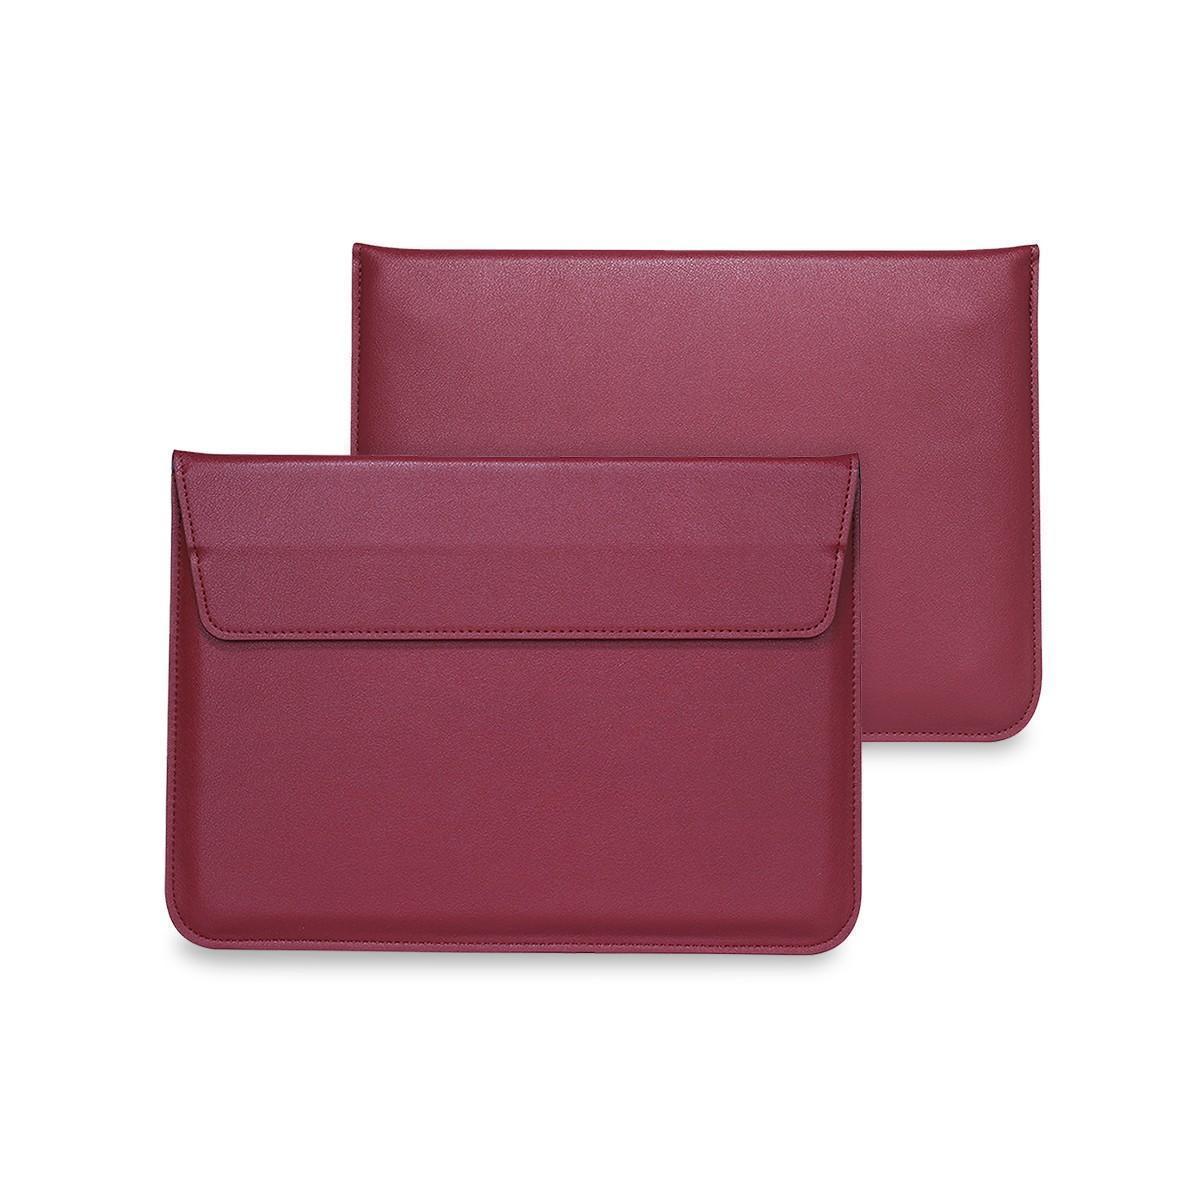 Чехол-конверт Palmexx для Apple MacBook Air 13/Pro Retina 13 (PX/Laet New AIR13) Wine Red